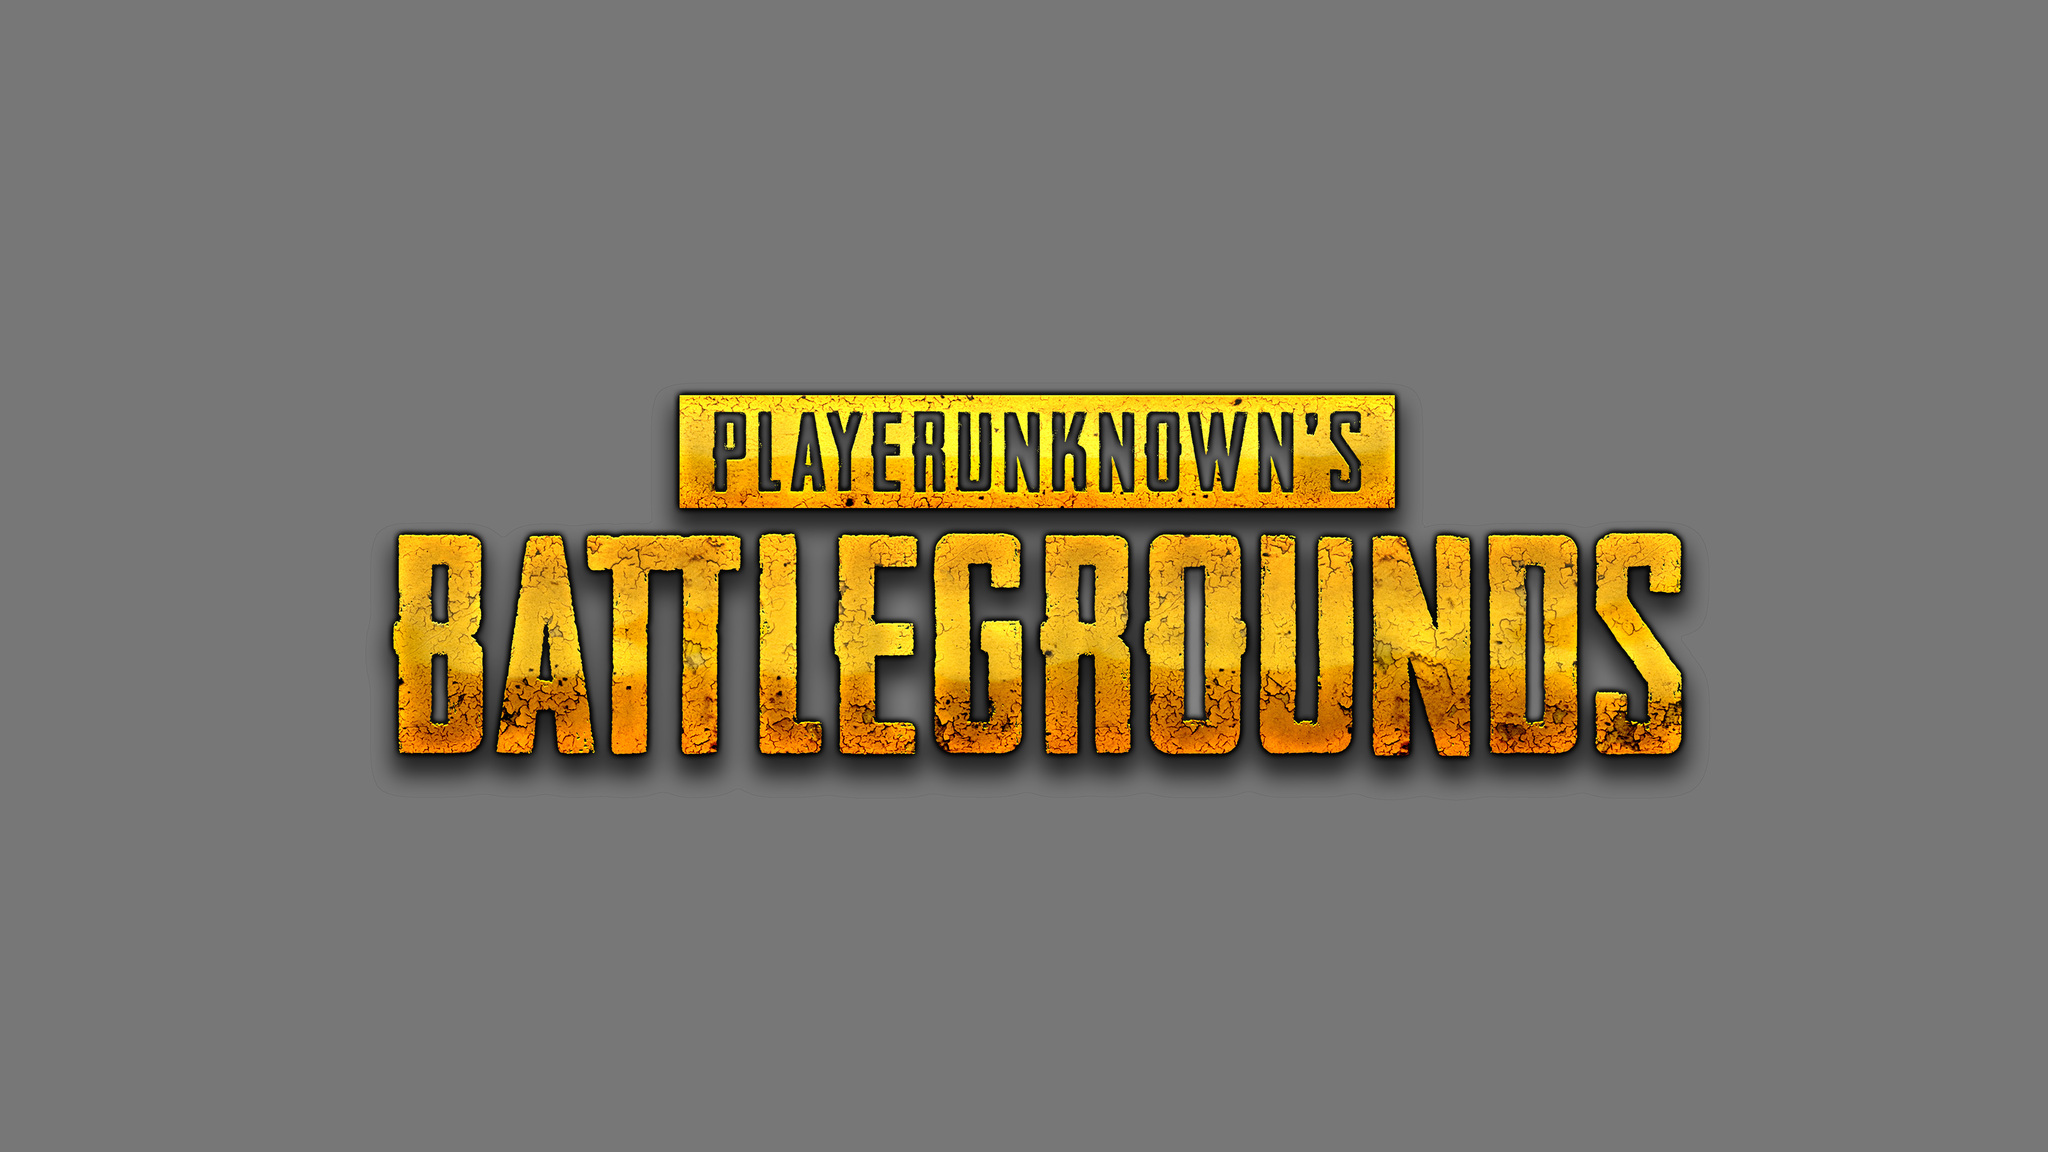 2048x1152 Playerunknowns Battlegrounds Logo 5k 2048x1152 Resolution